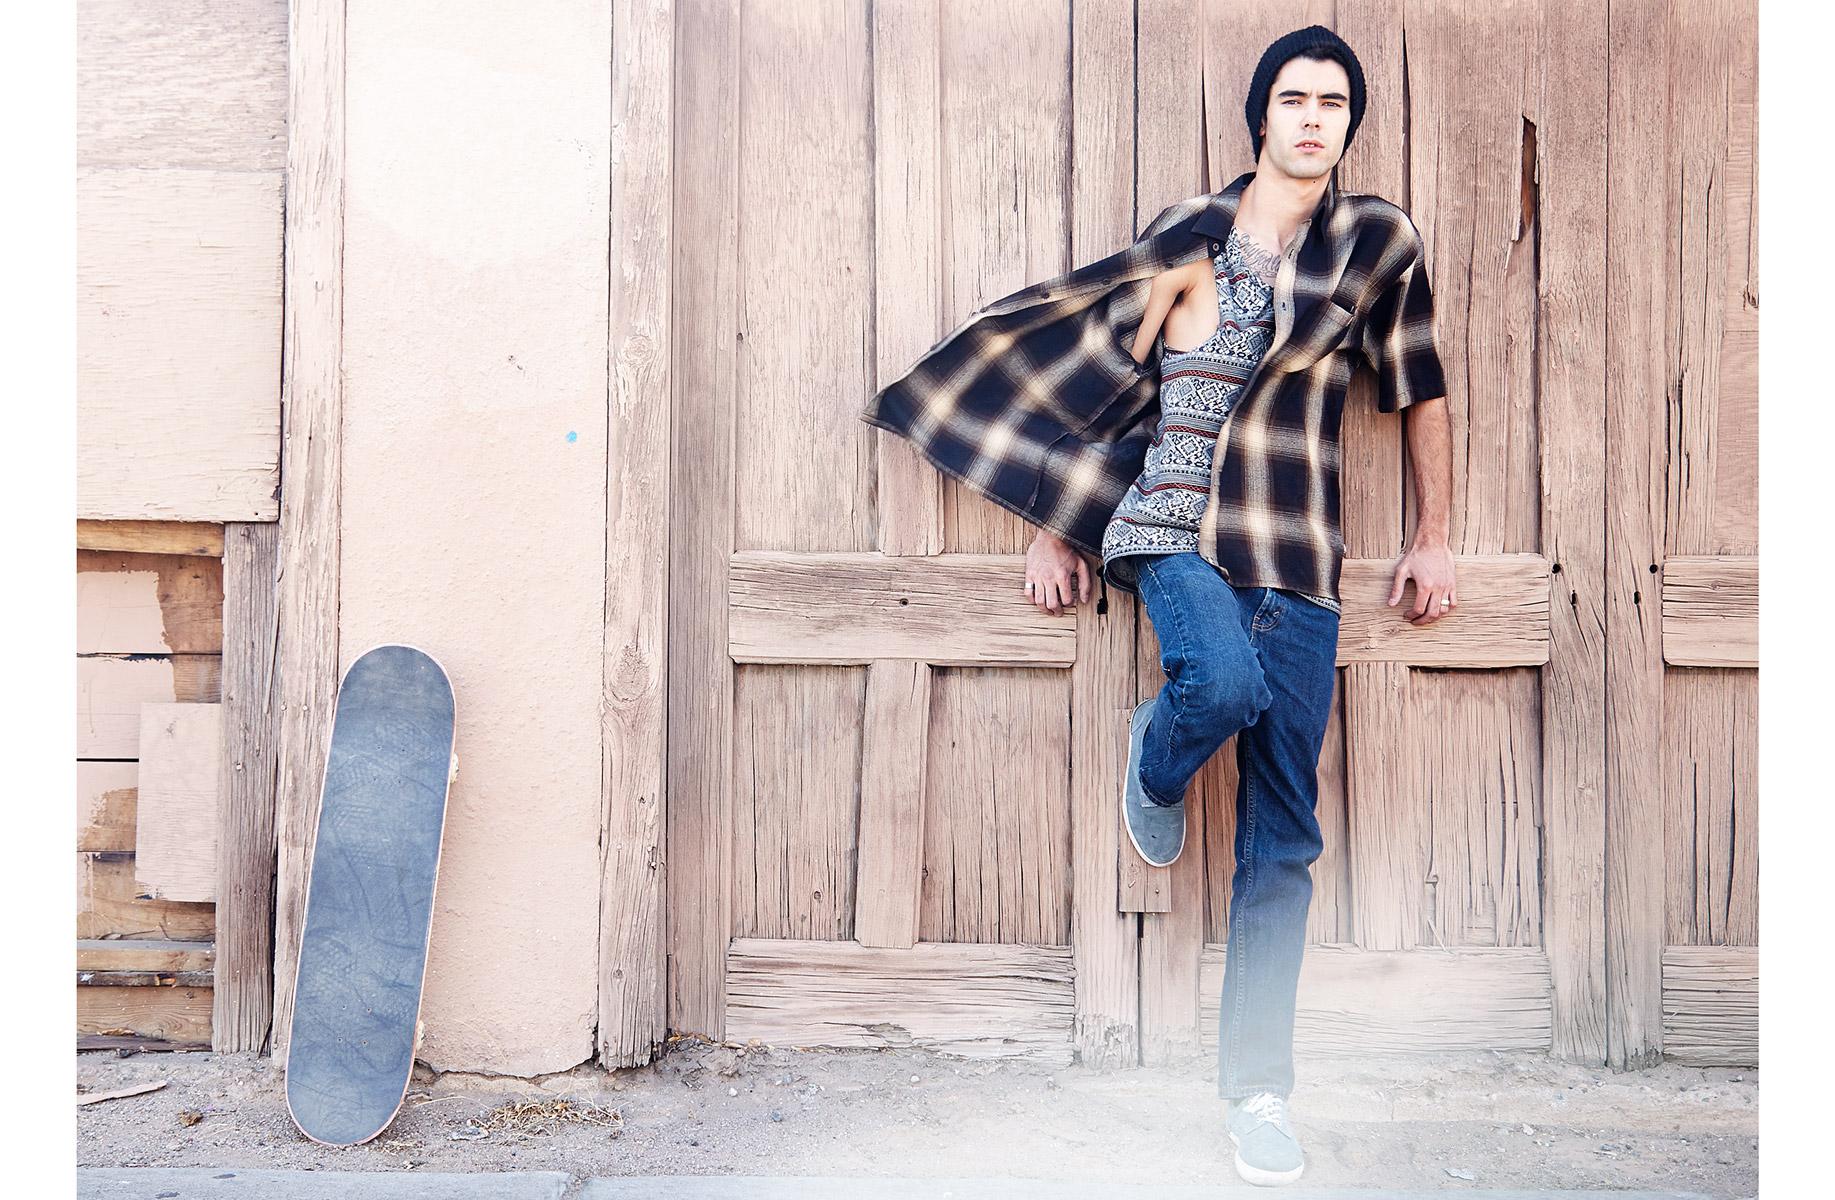 new-mexico-albuquerque-male-models-men-10.jpg